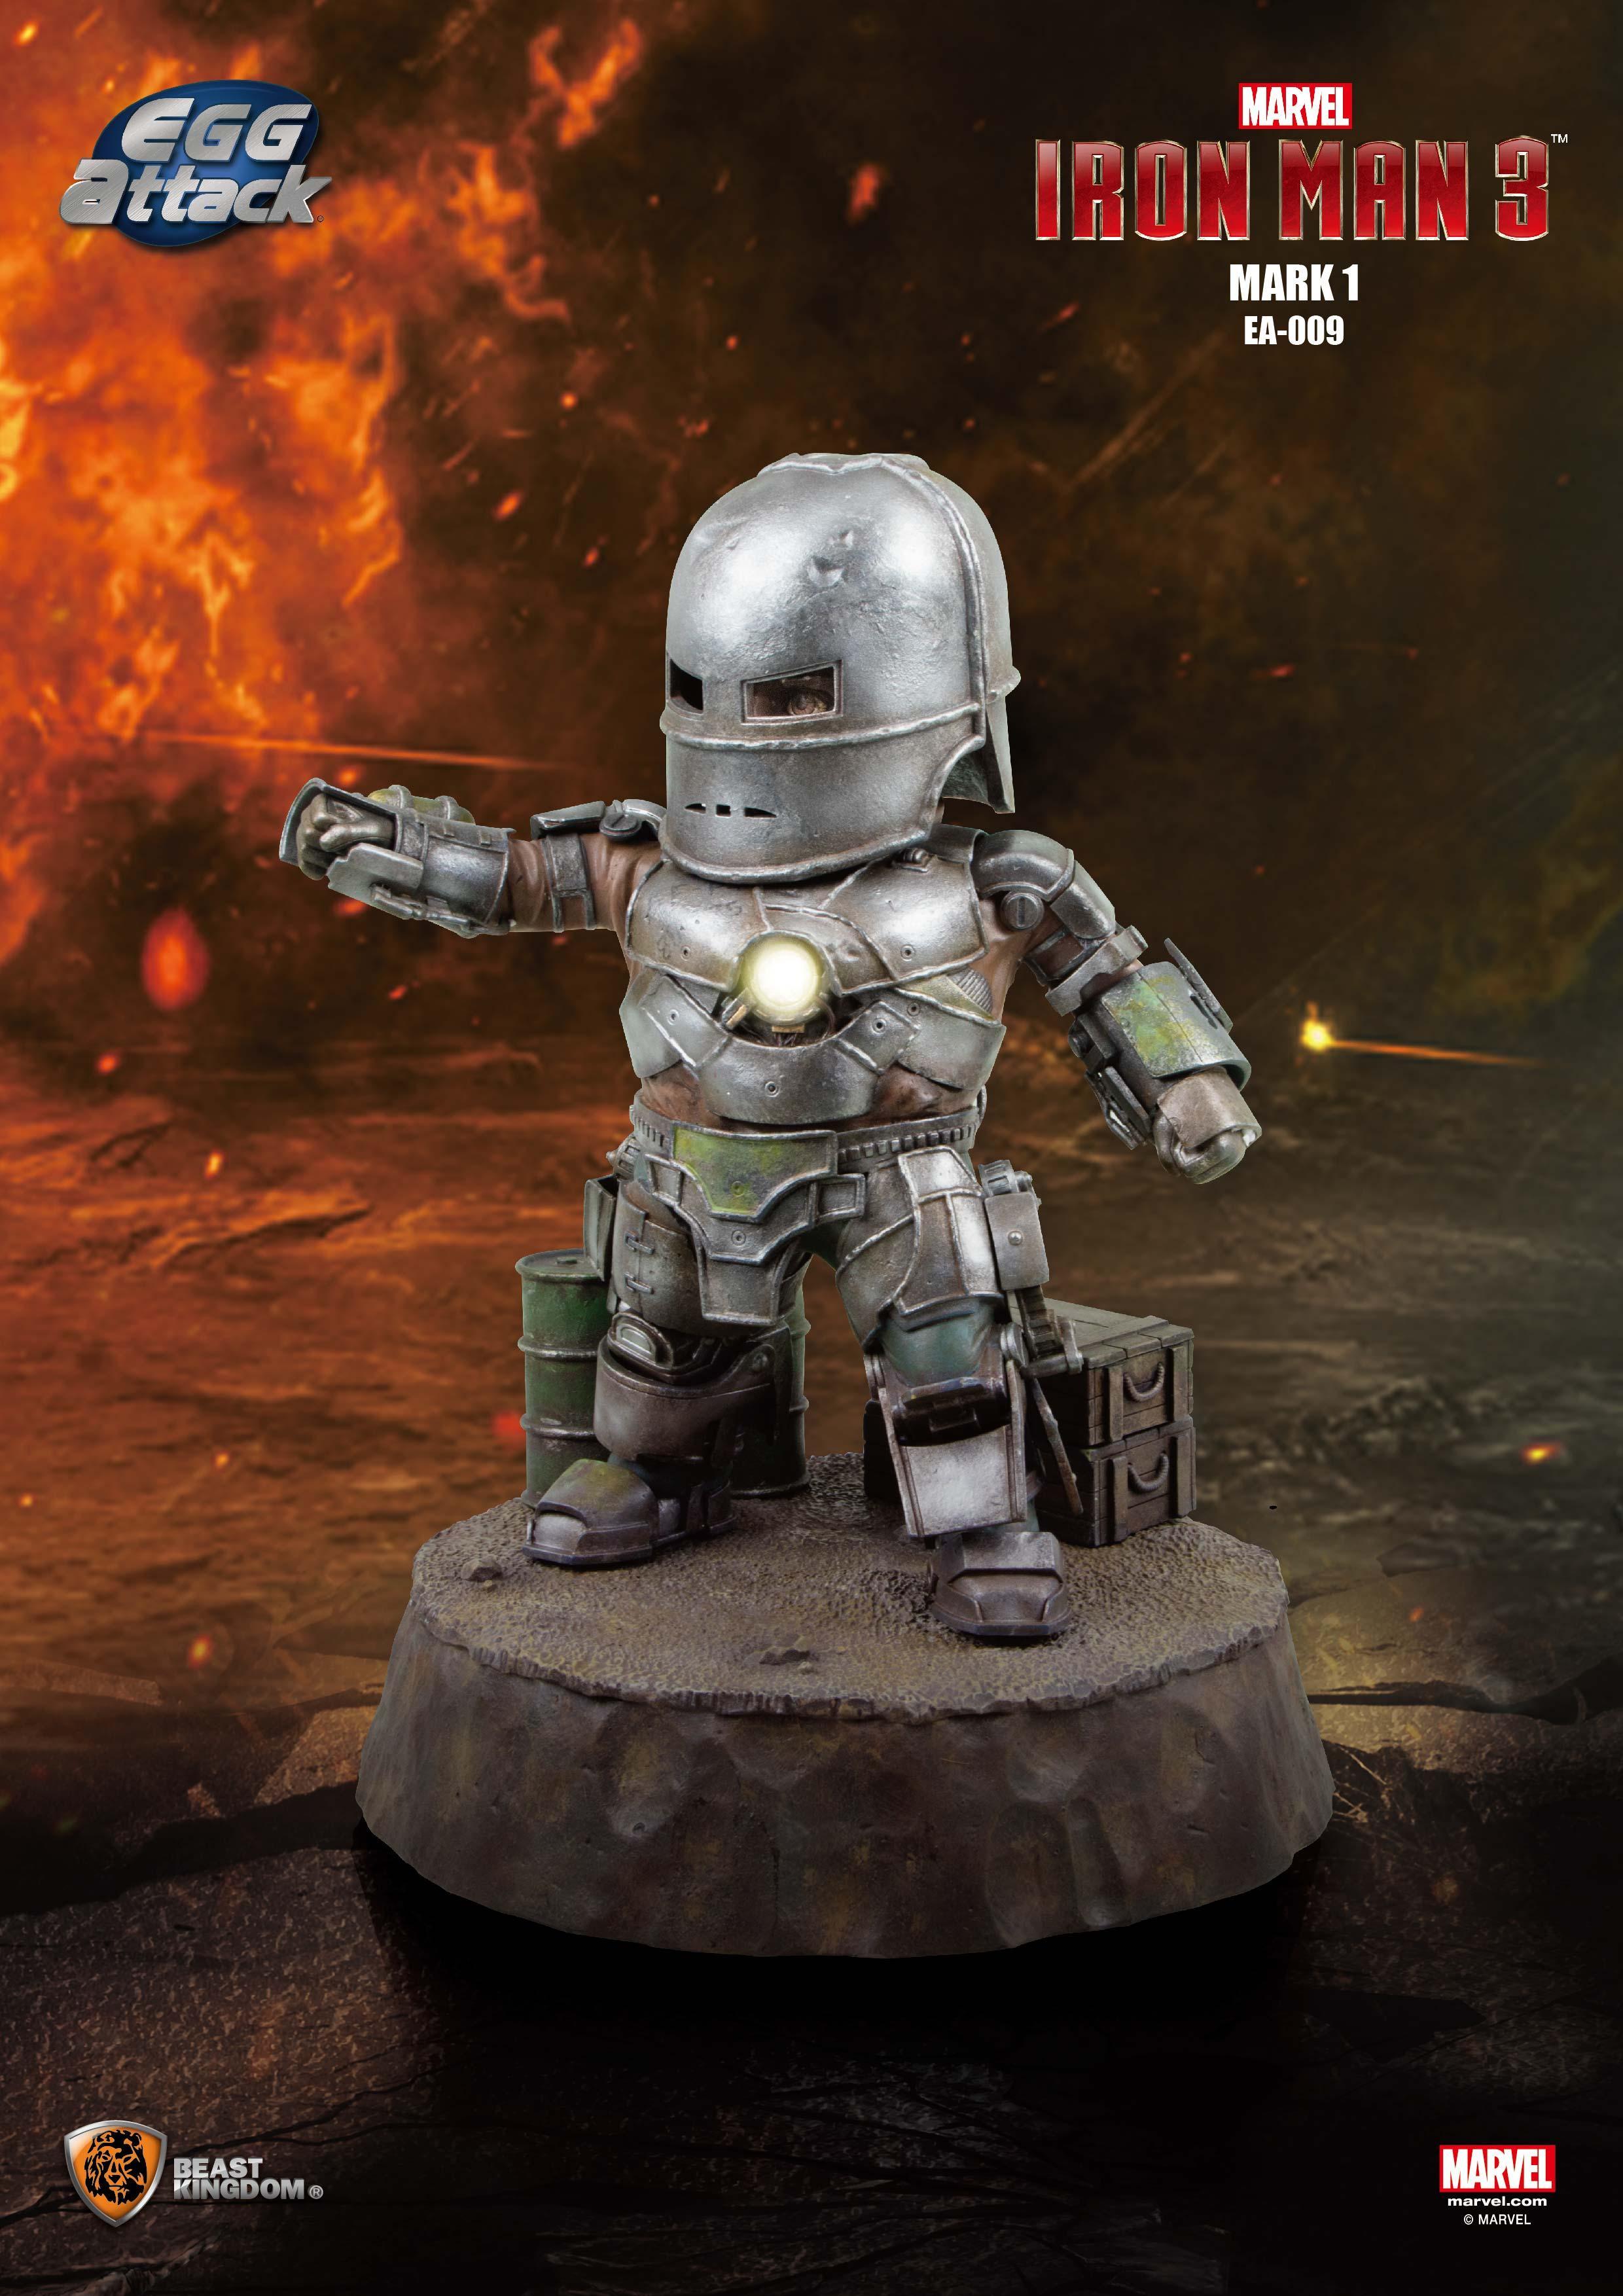 [BEAST KINGDOM] Marvel - Iron Man 3: Iron Man Mark 1 [EA-009]